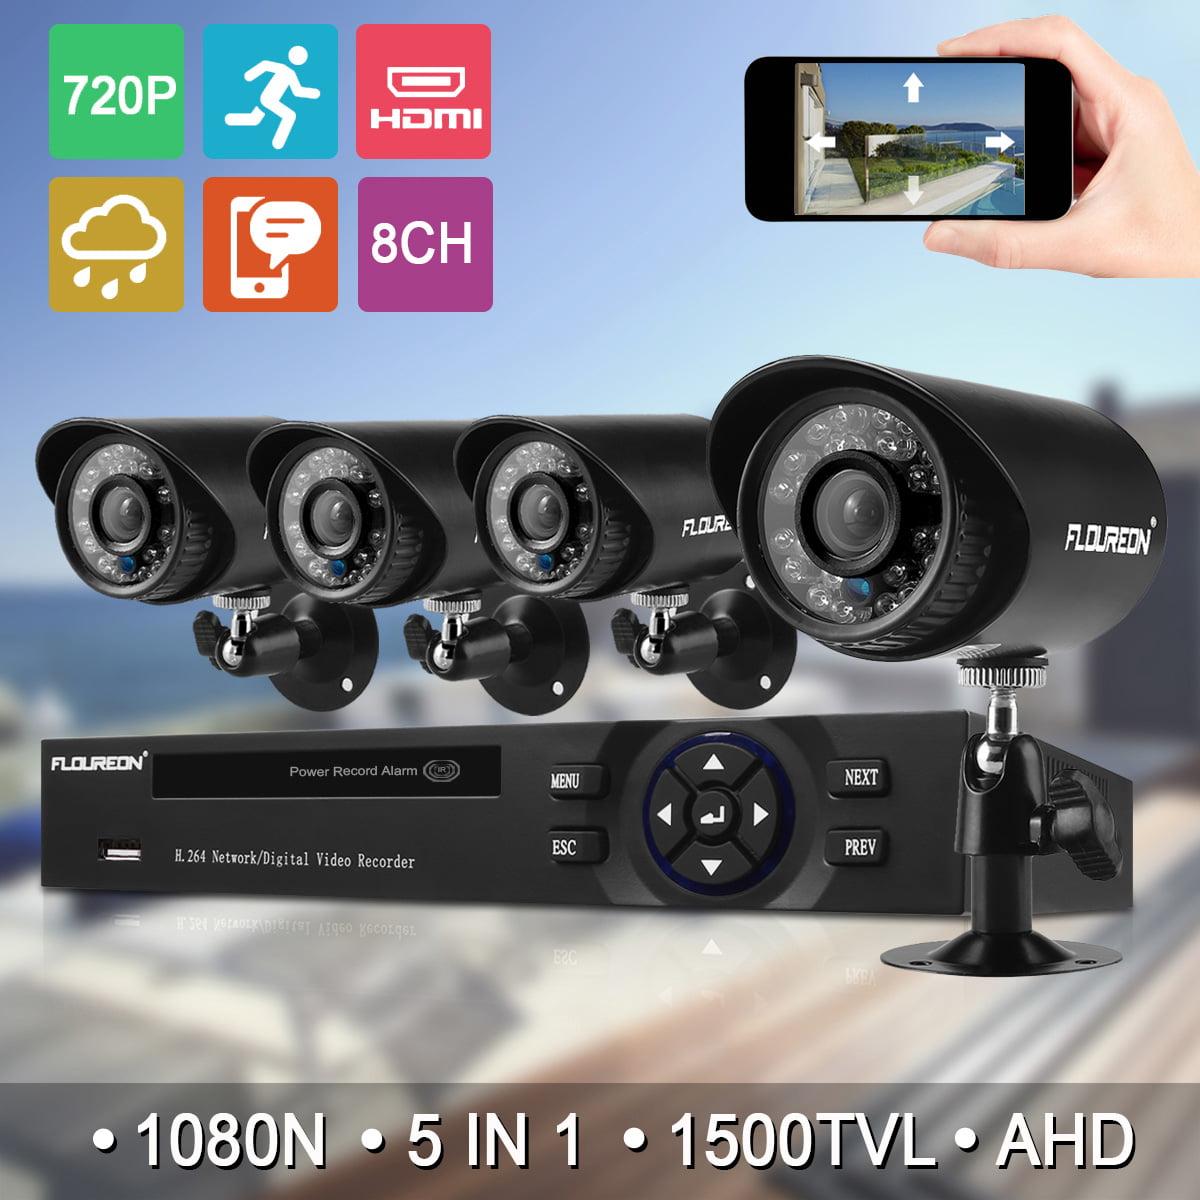 FLOUREON 1 X 8CH 1080N AHD DVR + 4 X Outdoor 1500TVL 720P CCCTV Camera Home Security Surveillance System